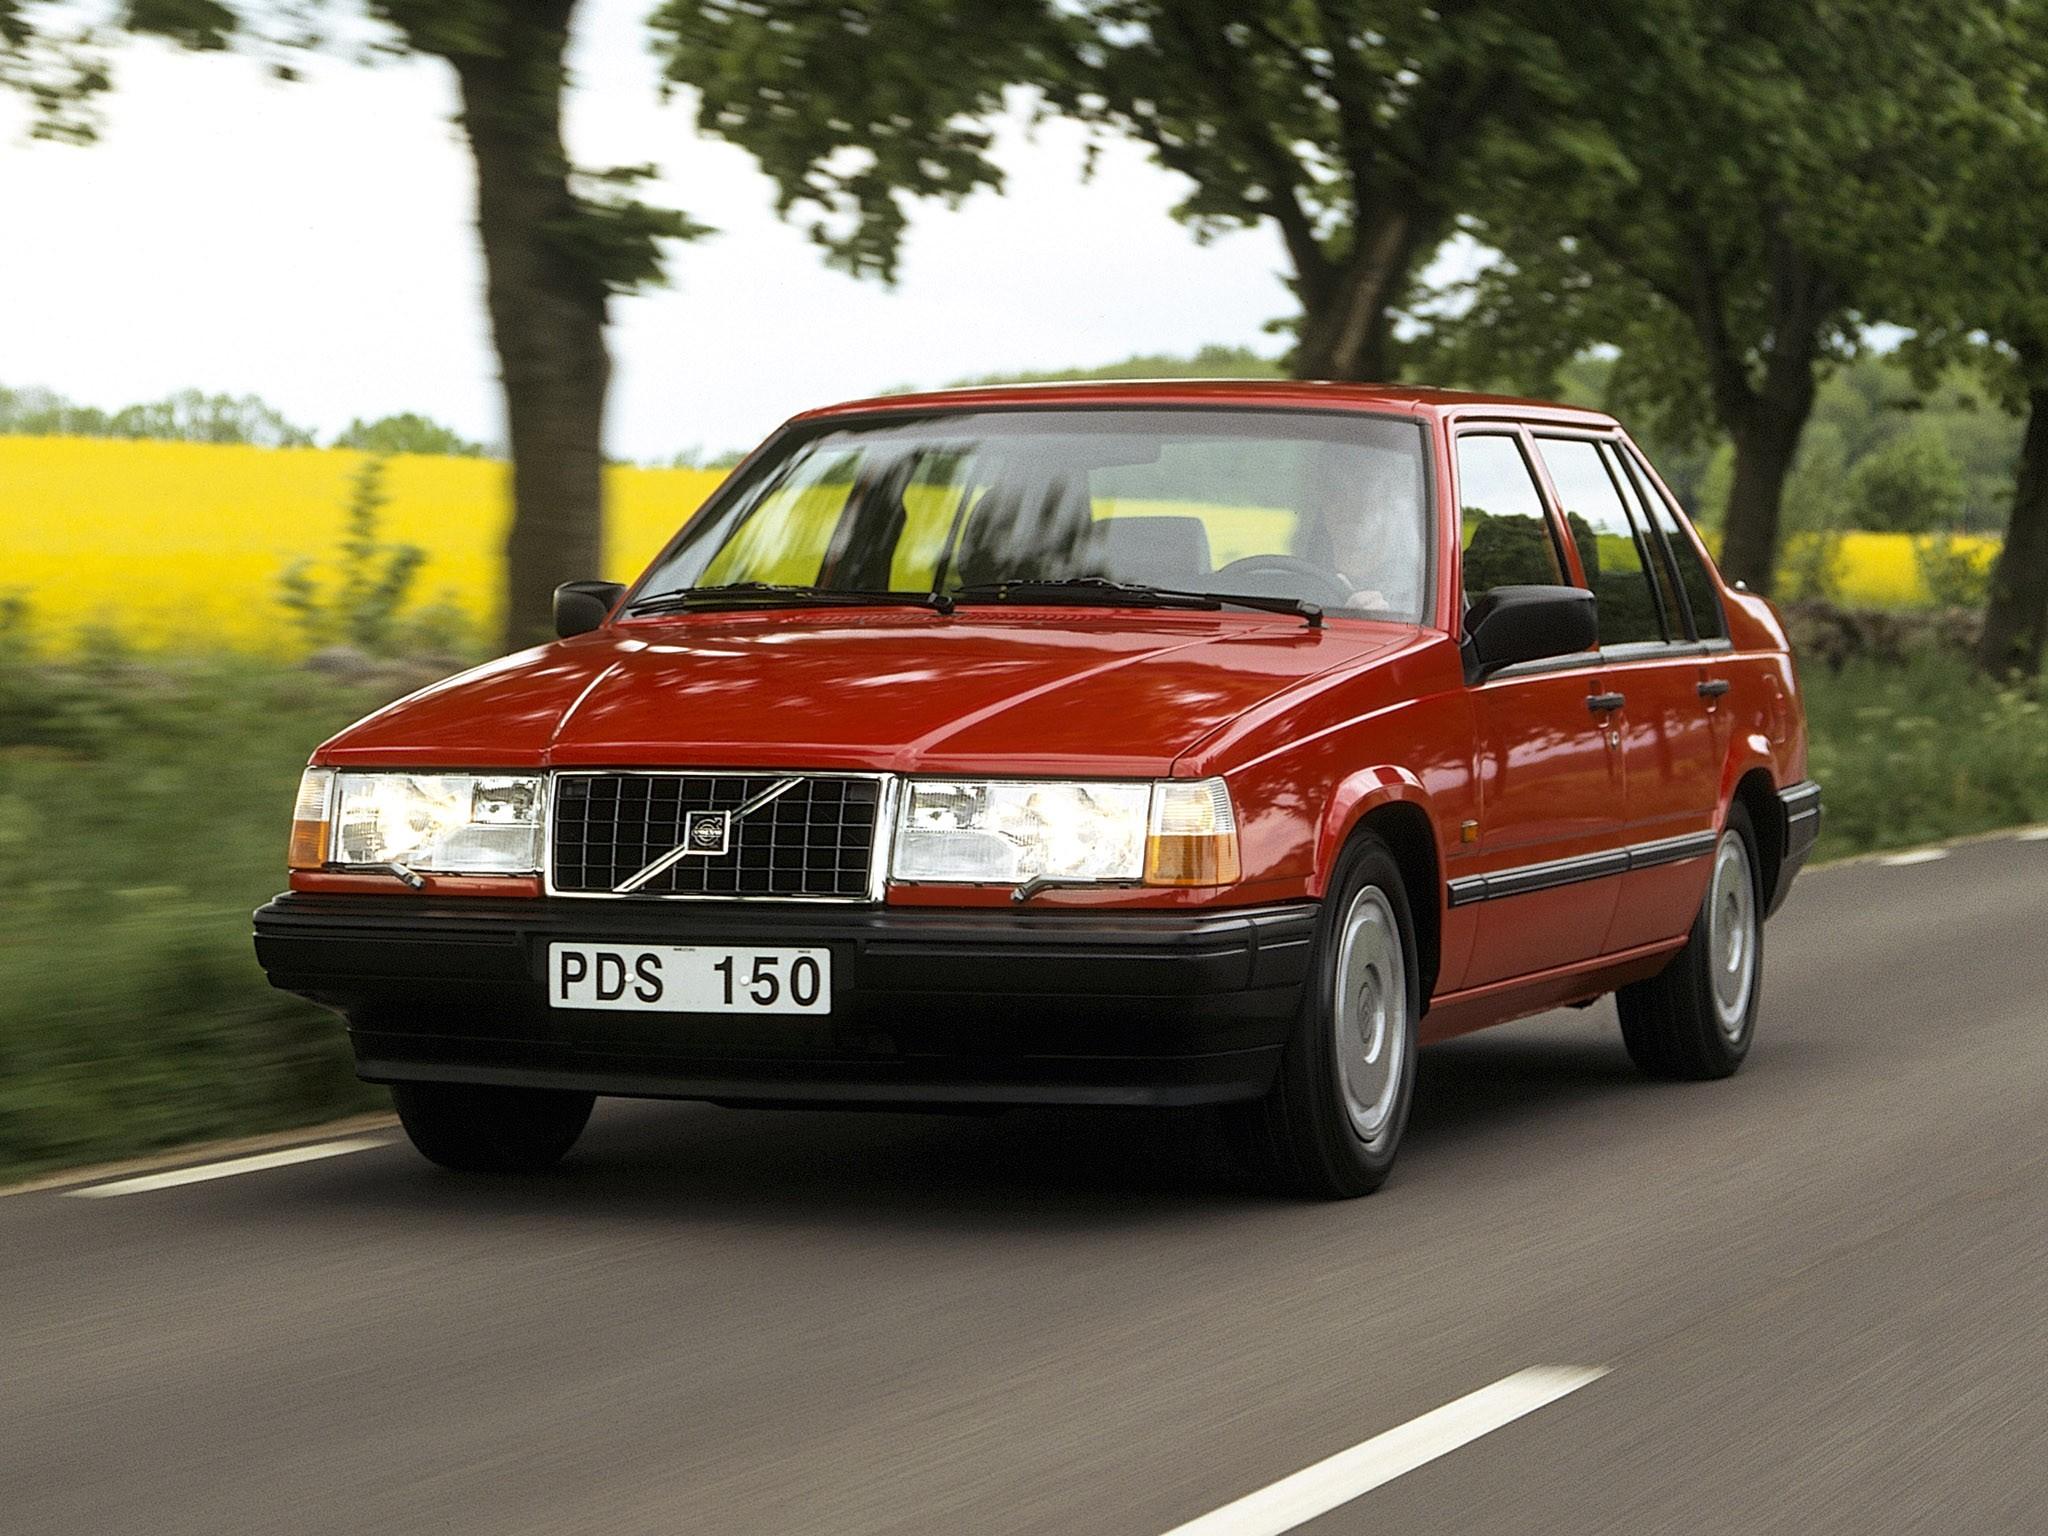 VOLVO 940 - 1990, 1991, 1992, 1993, 1994, 1995, 1996, 1997 - autoevolution